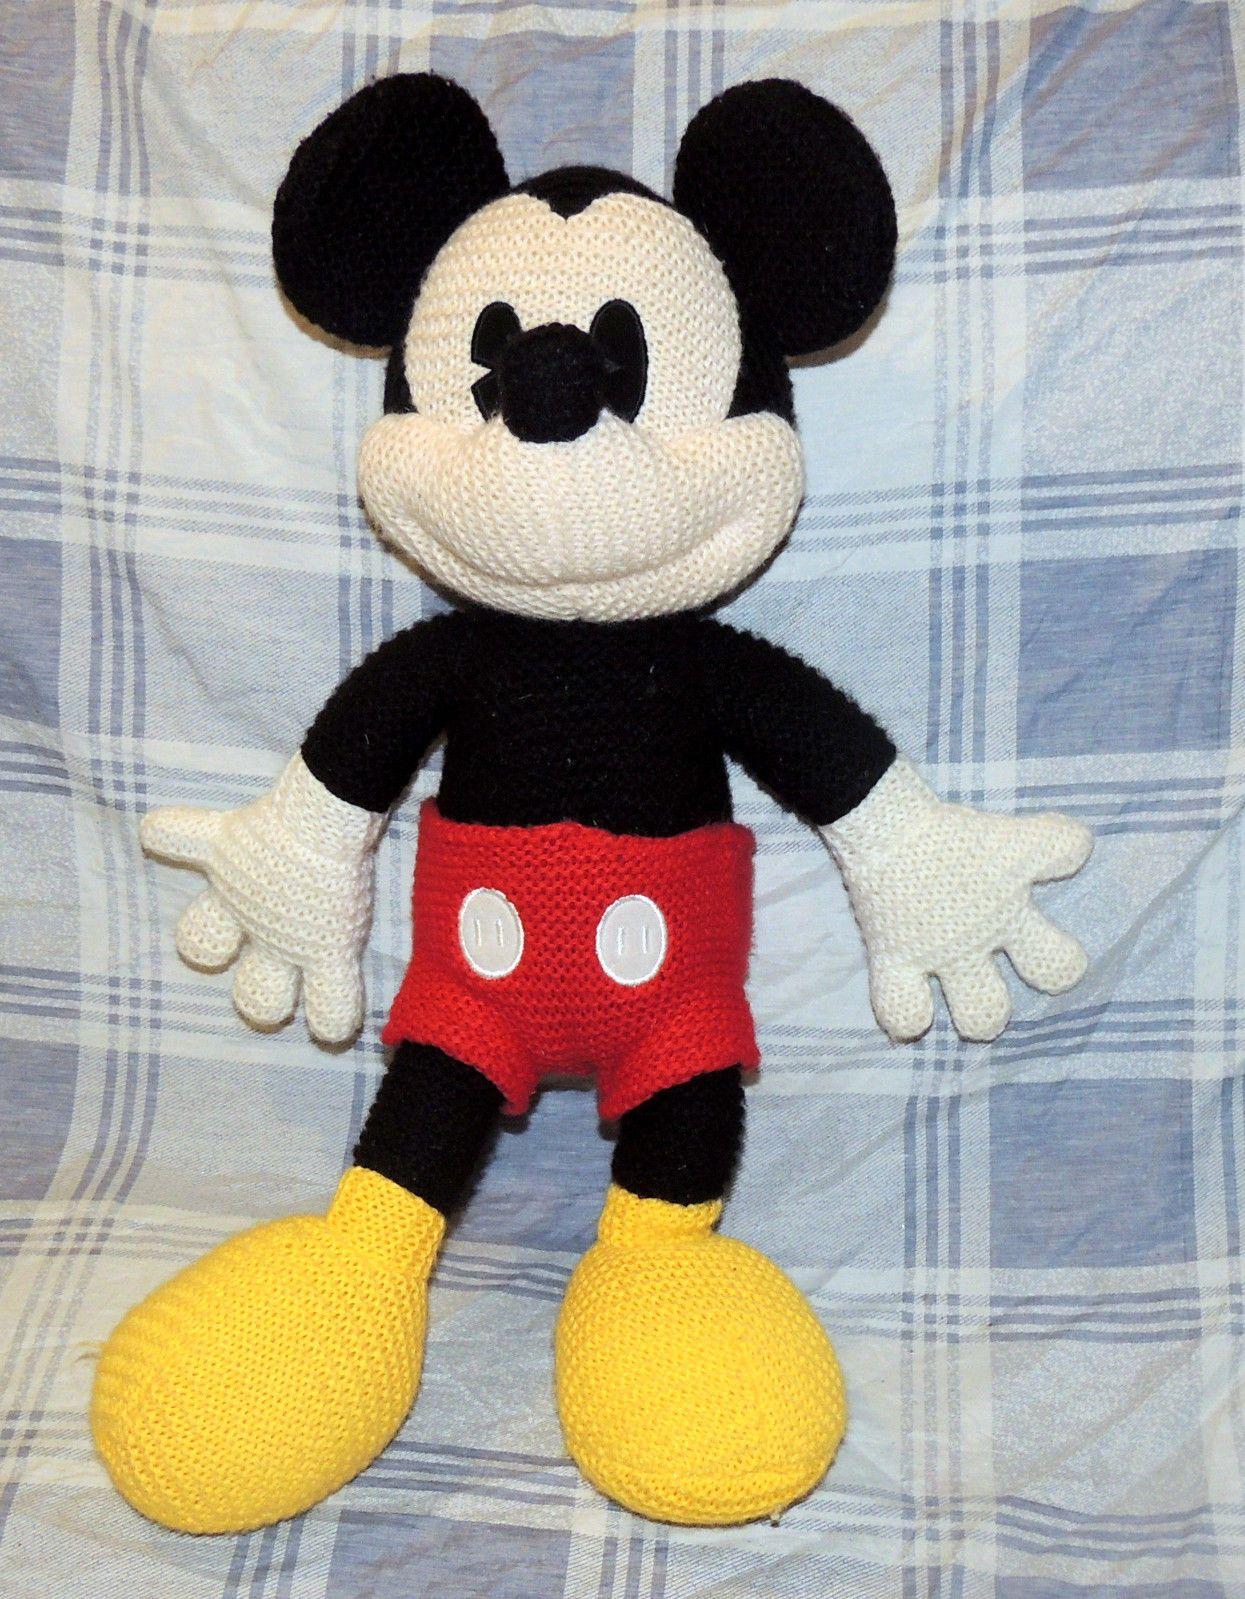 Mickey Mouse Knit Crochet Plush Toy Disneyland Disney